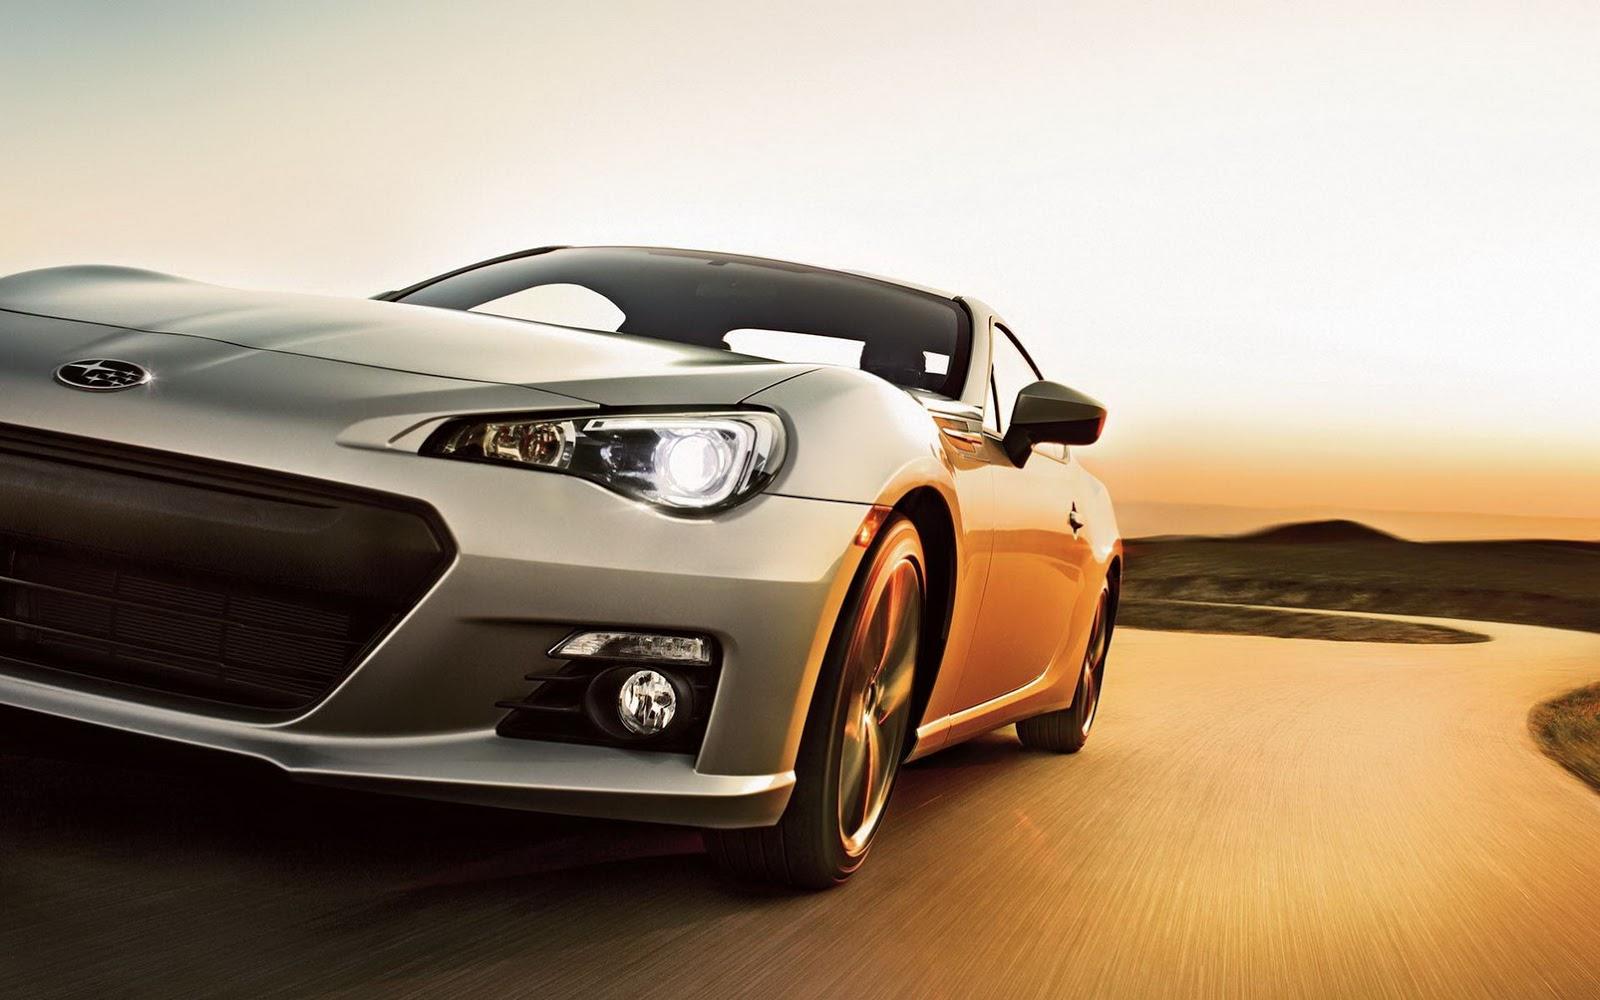 2017 Subaru BRZ Facelift Leaked On The Web | Carscoops